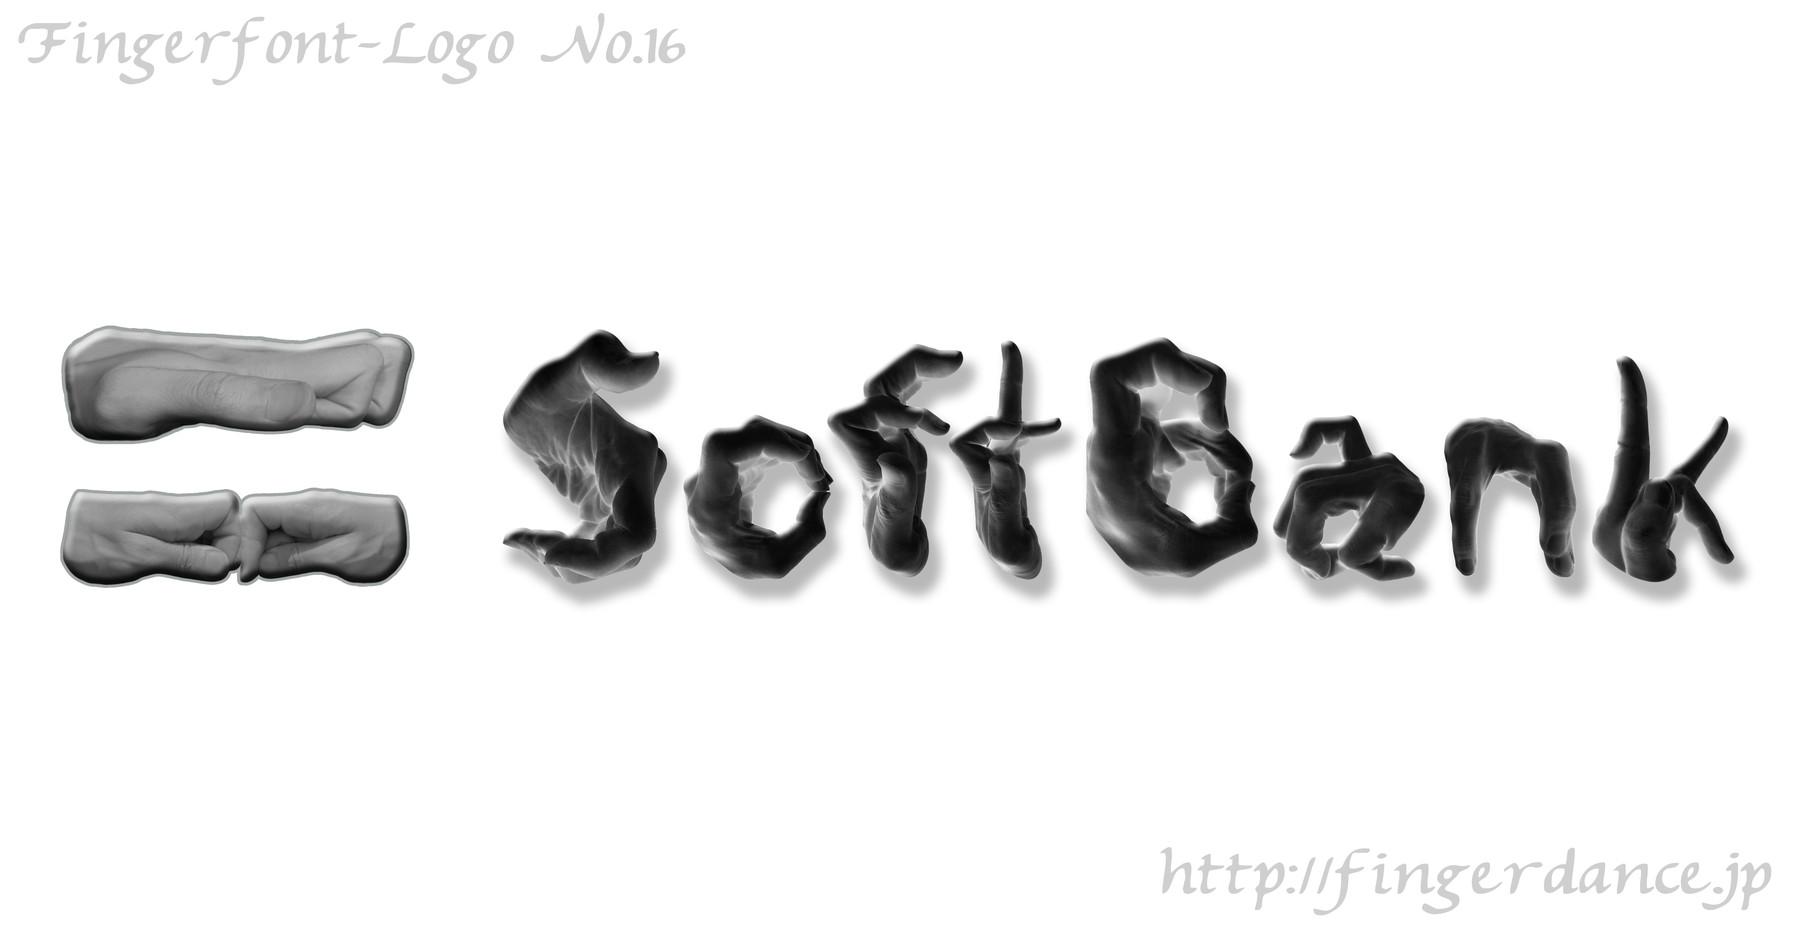 SoftBank-fingerhttp://fingerdance.jp/L/logohand ソフトバンクフィンガーロゴハンド手指